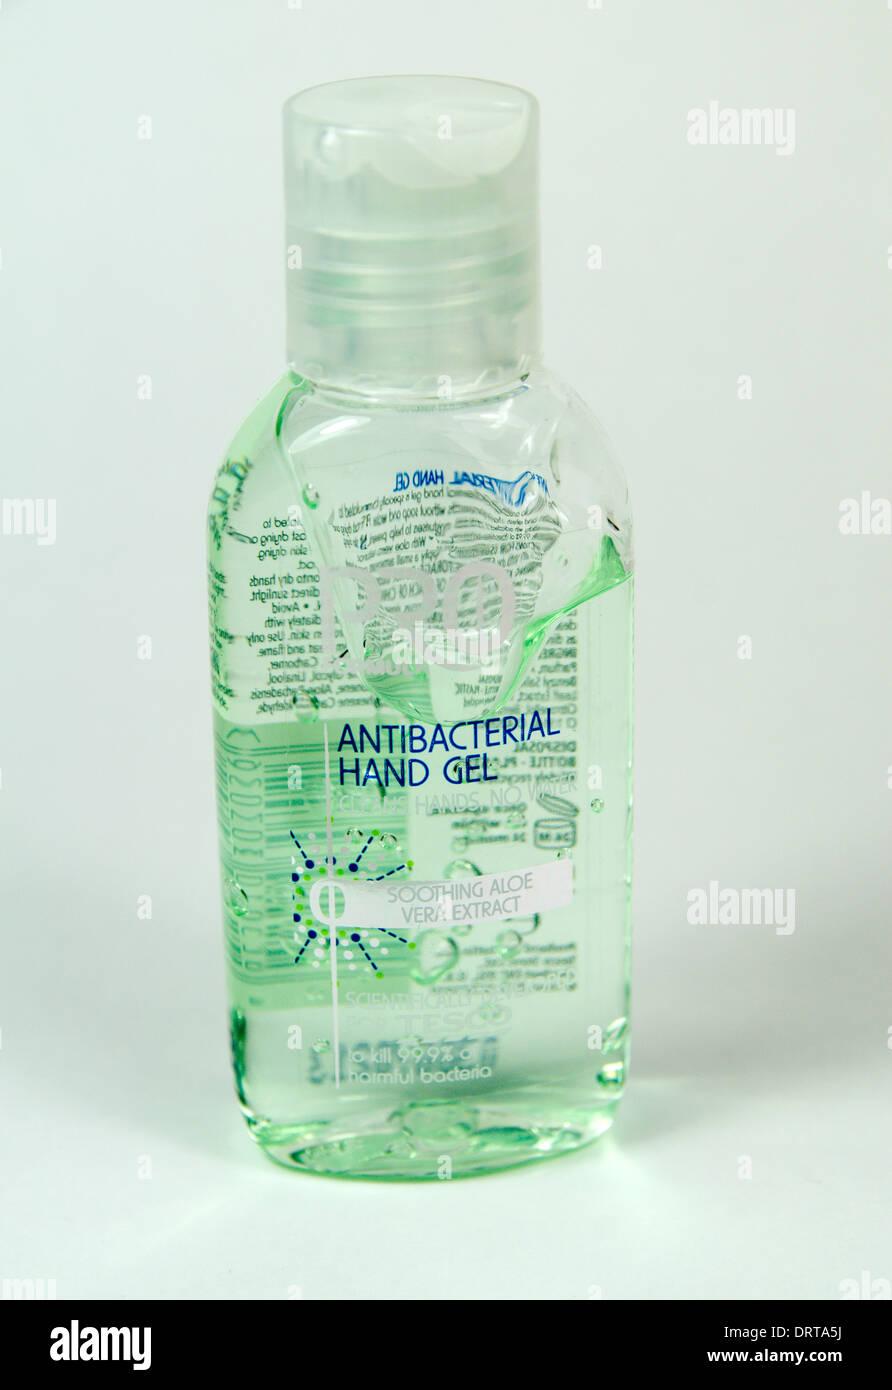 Bottle of antibacterial hand gel - Stock Image